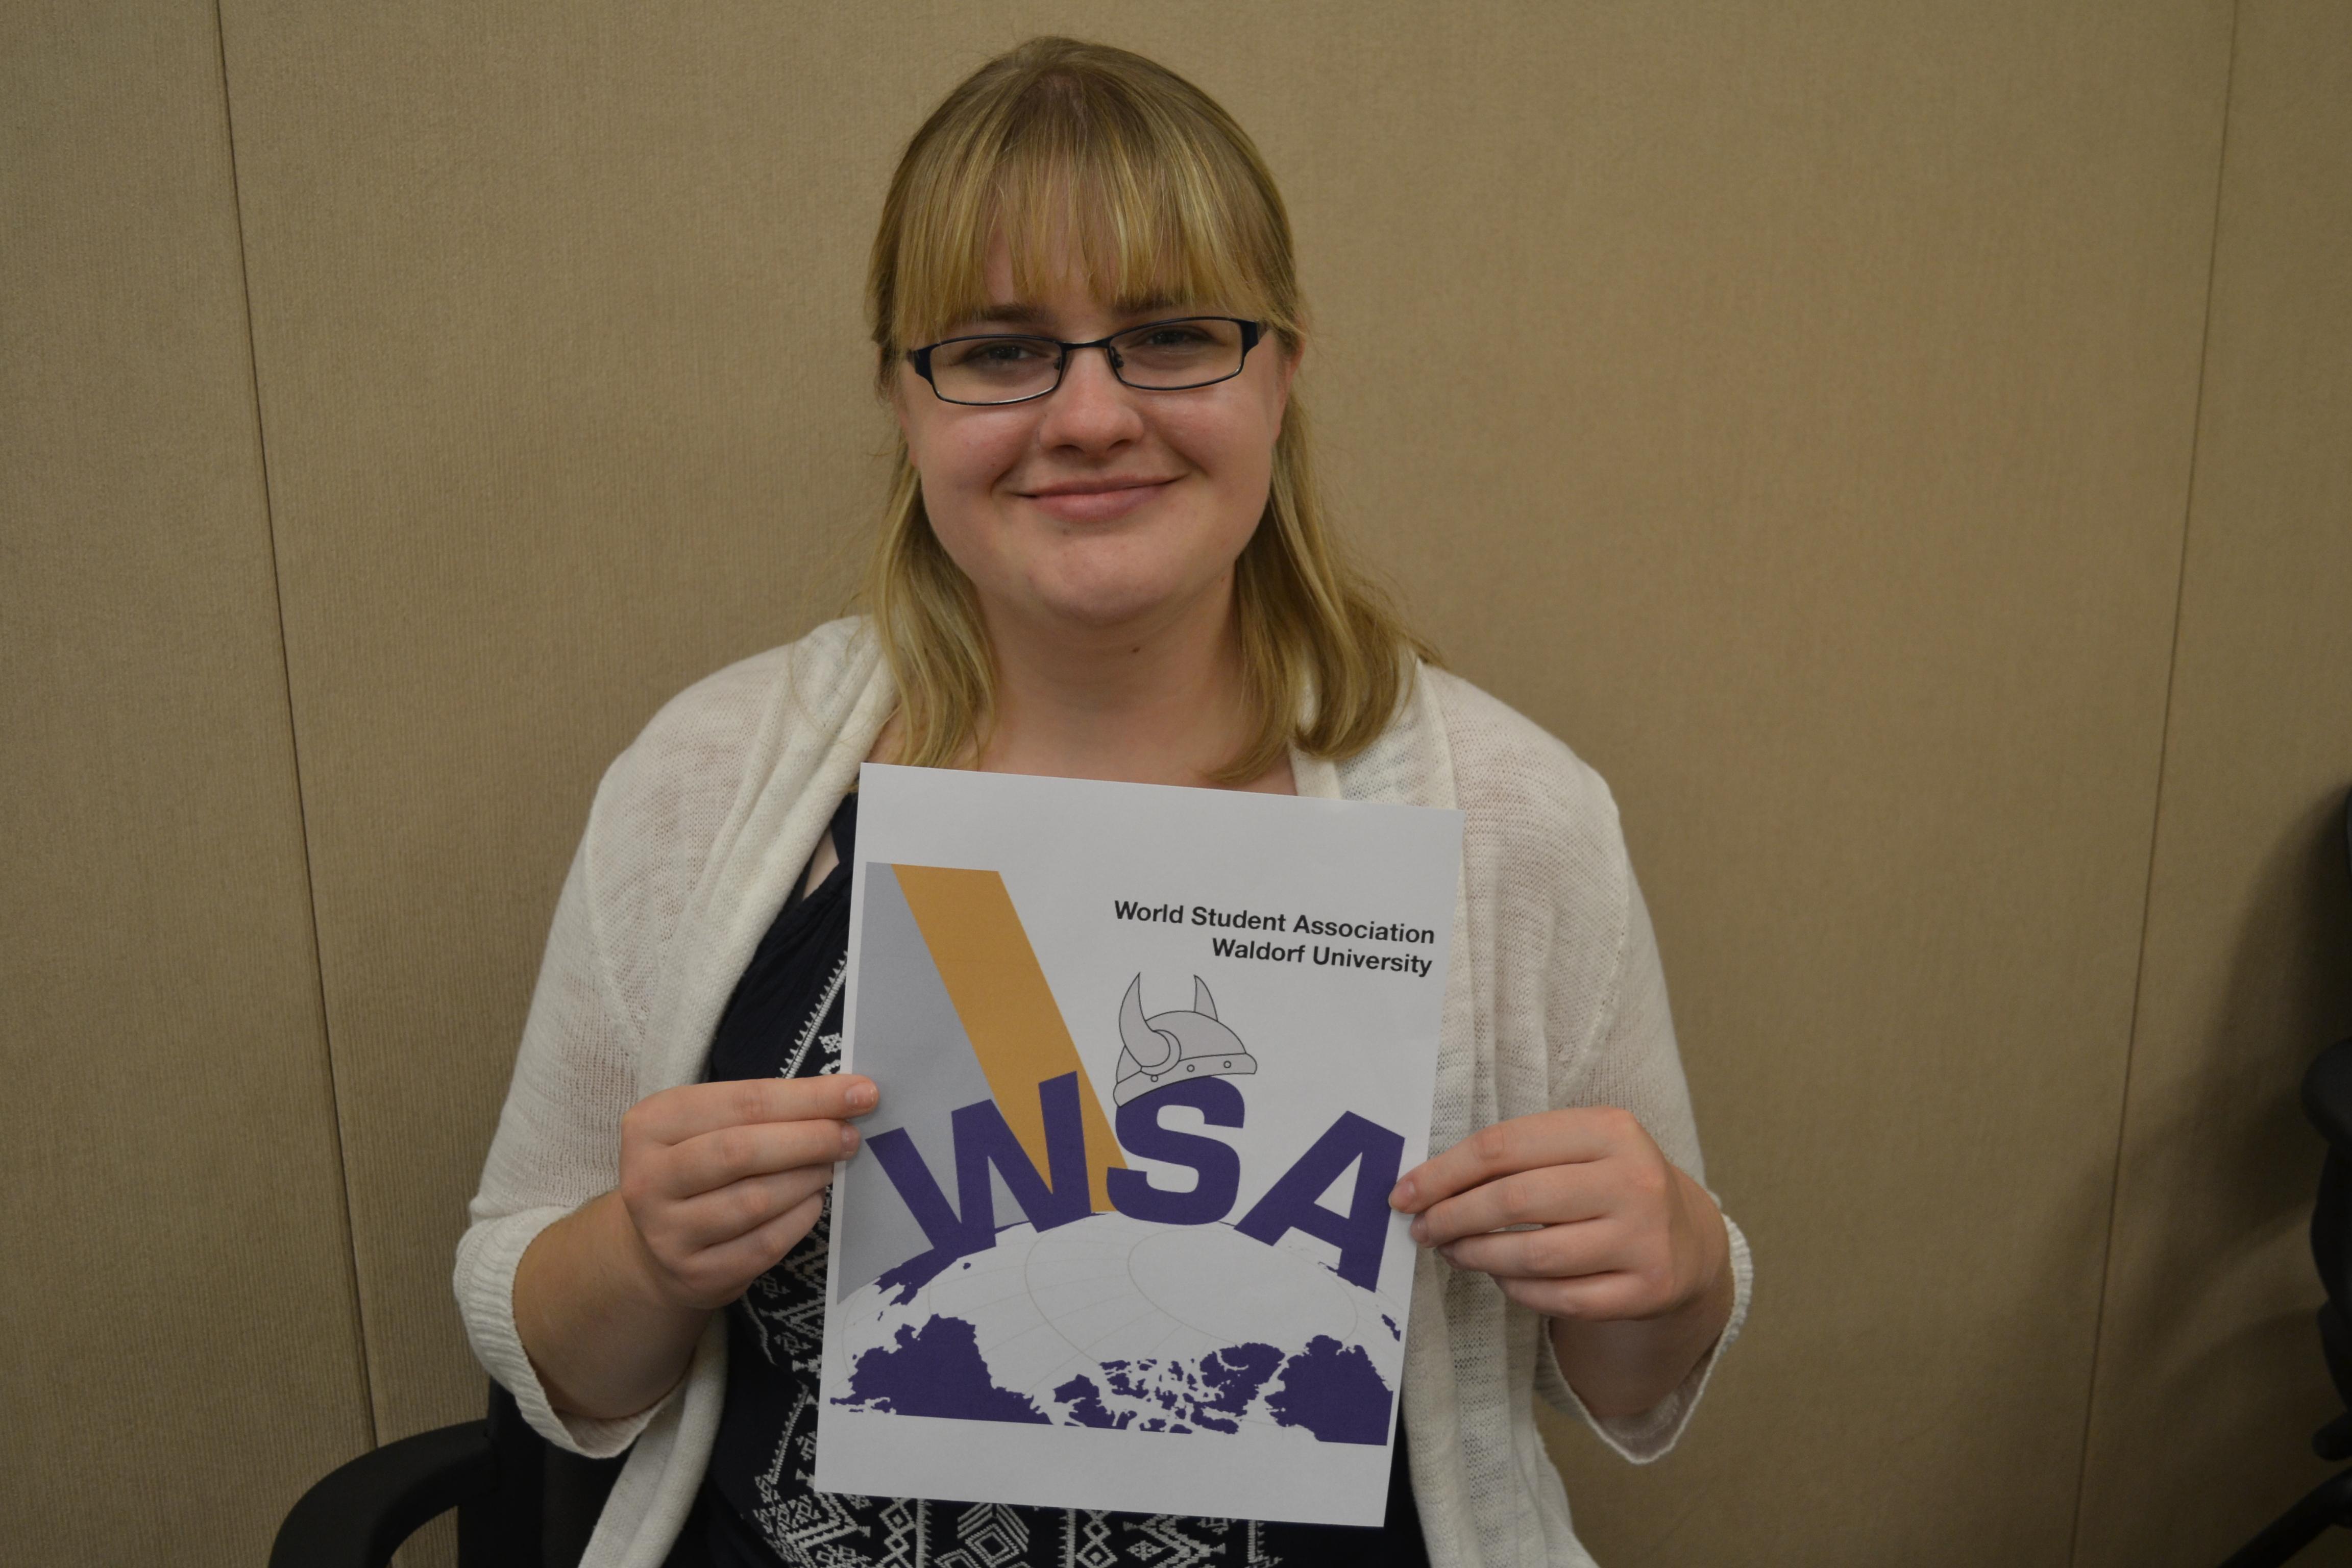 http://lobbyist.waldorf.edu/wp-content/uploads/Alyssa-Braun-with-WSA-logo-WSA-Dina-Selviana.jpg